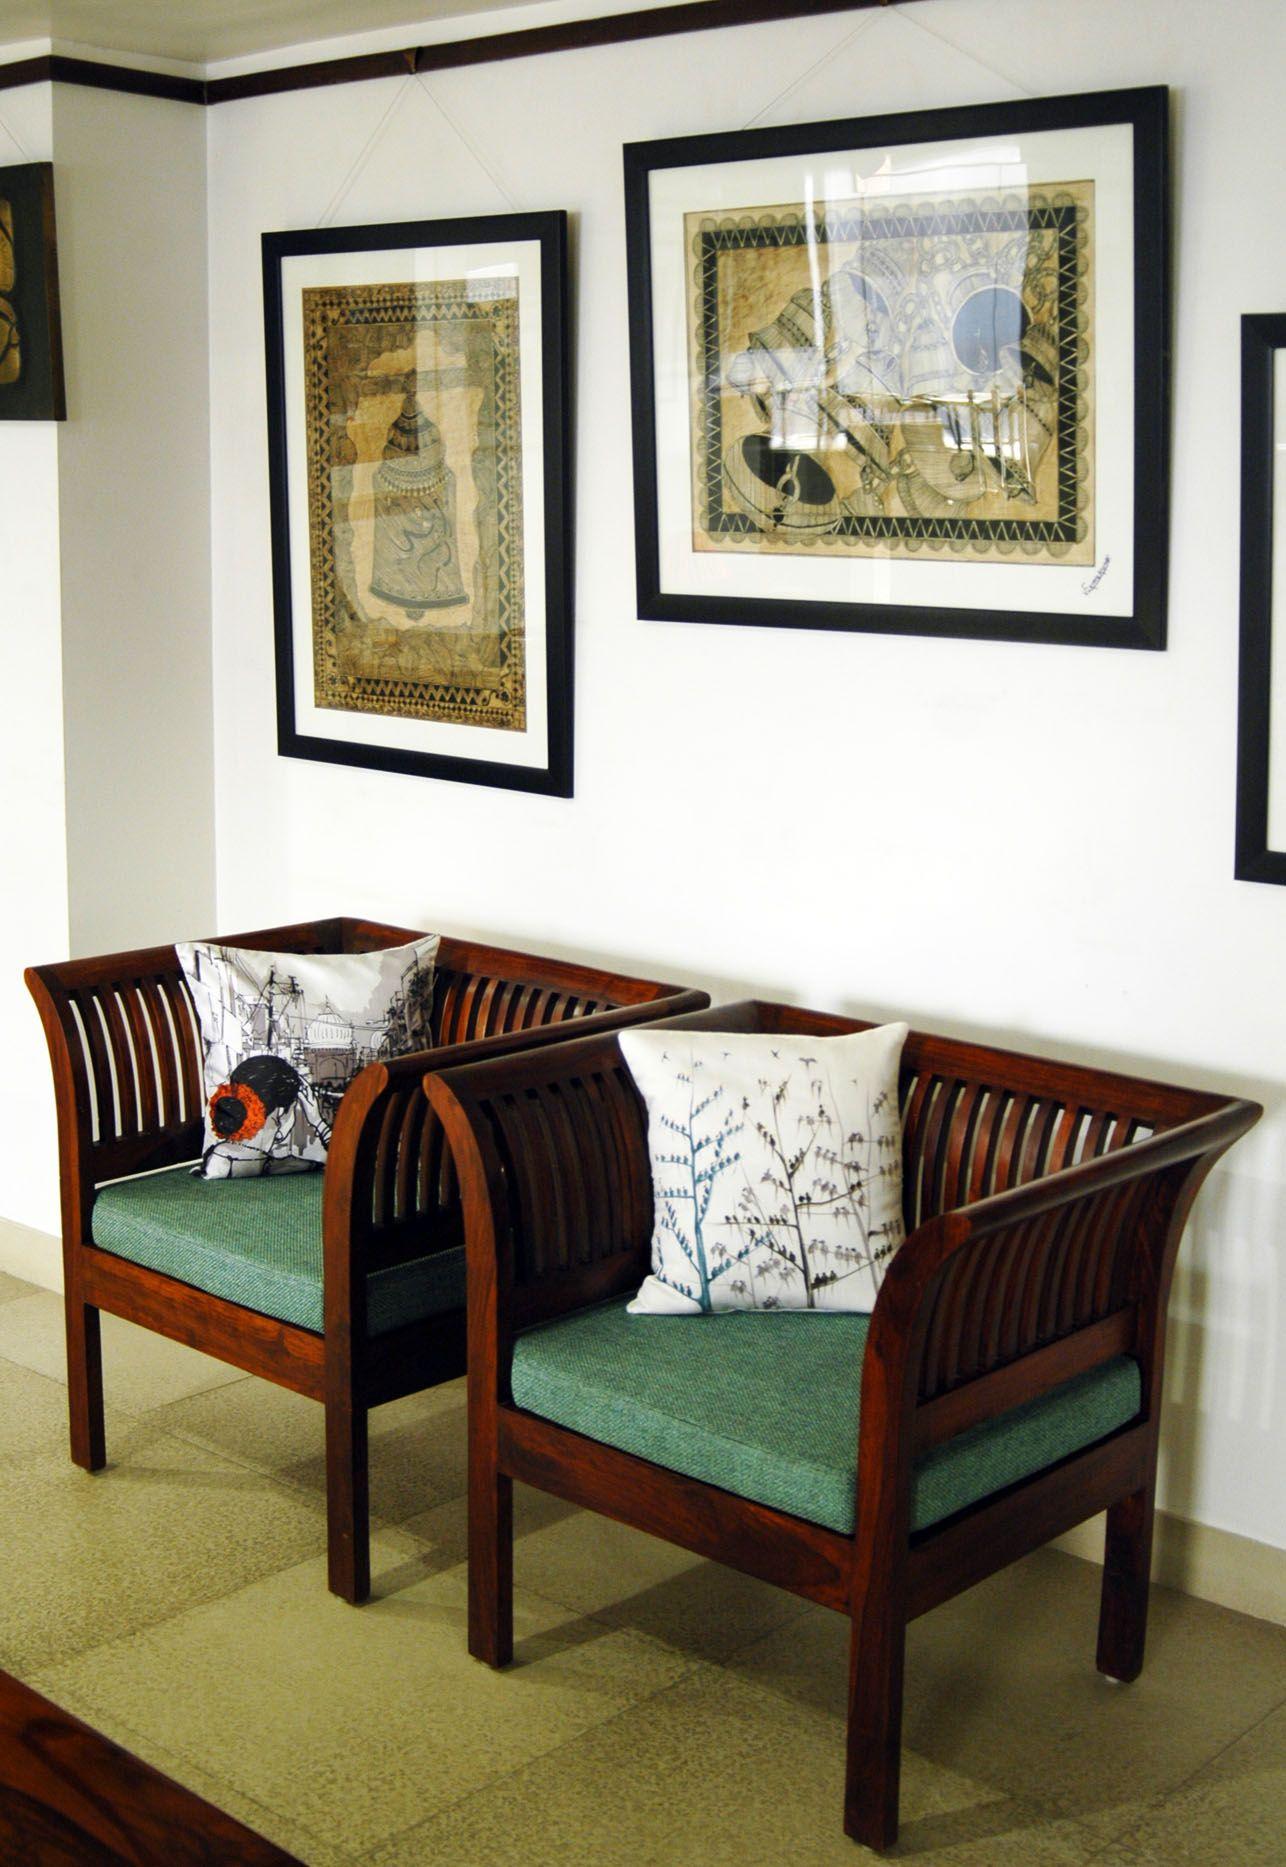 Rose Wood Sofa Chair Set Wooden Sofa Set Designs Furniture Design Living Room Living Room Sofa Design